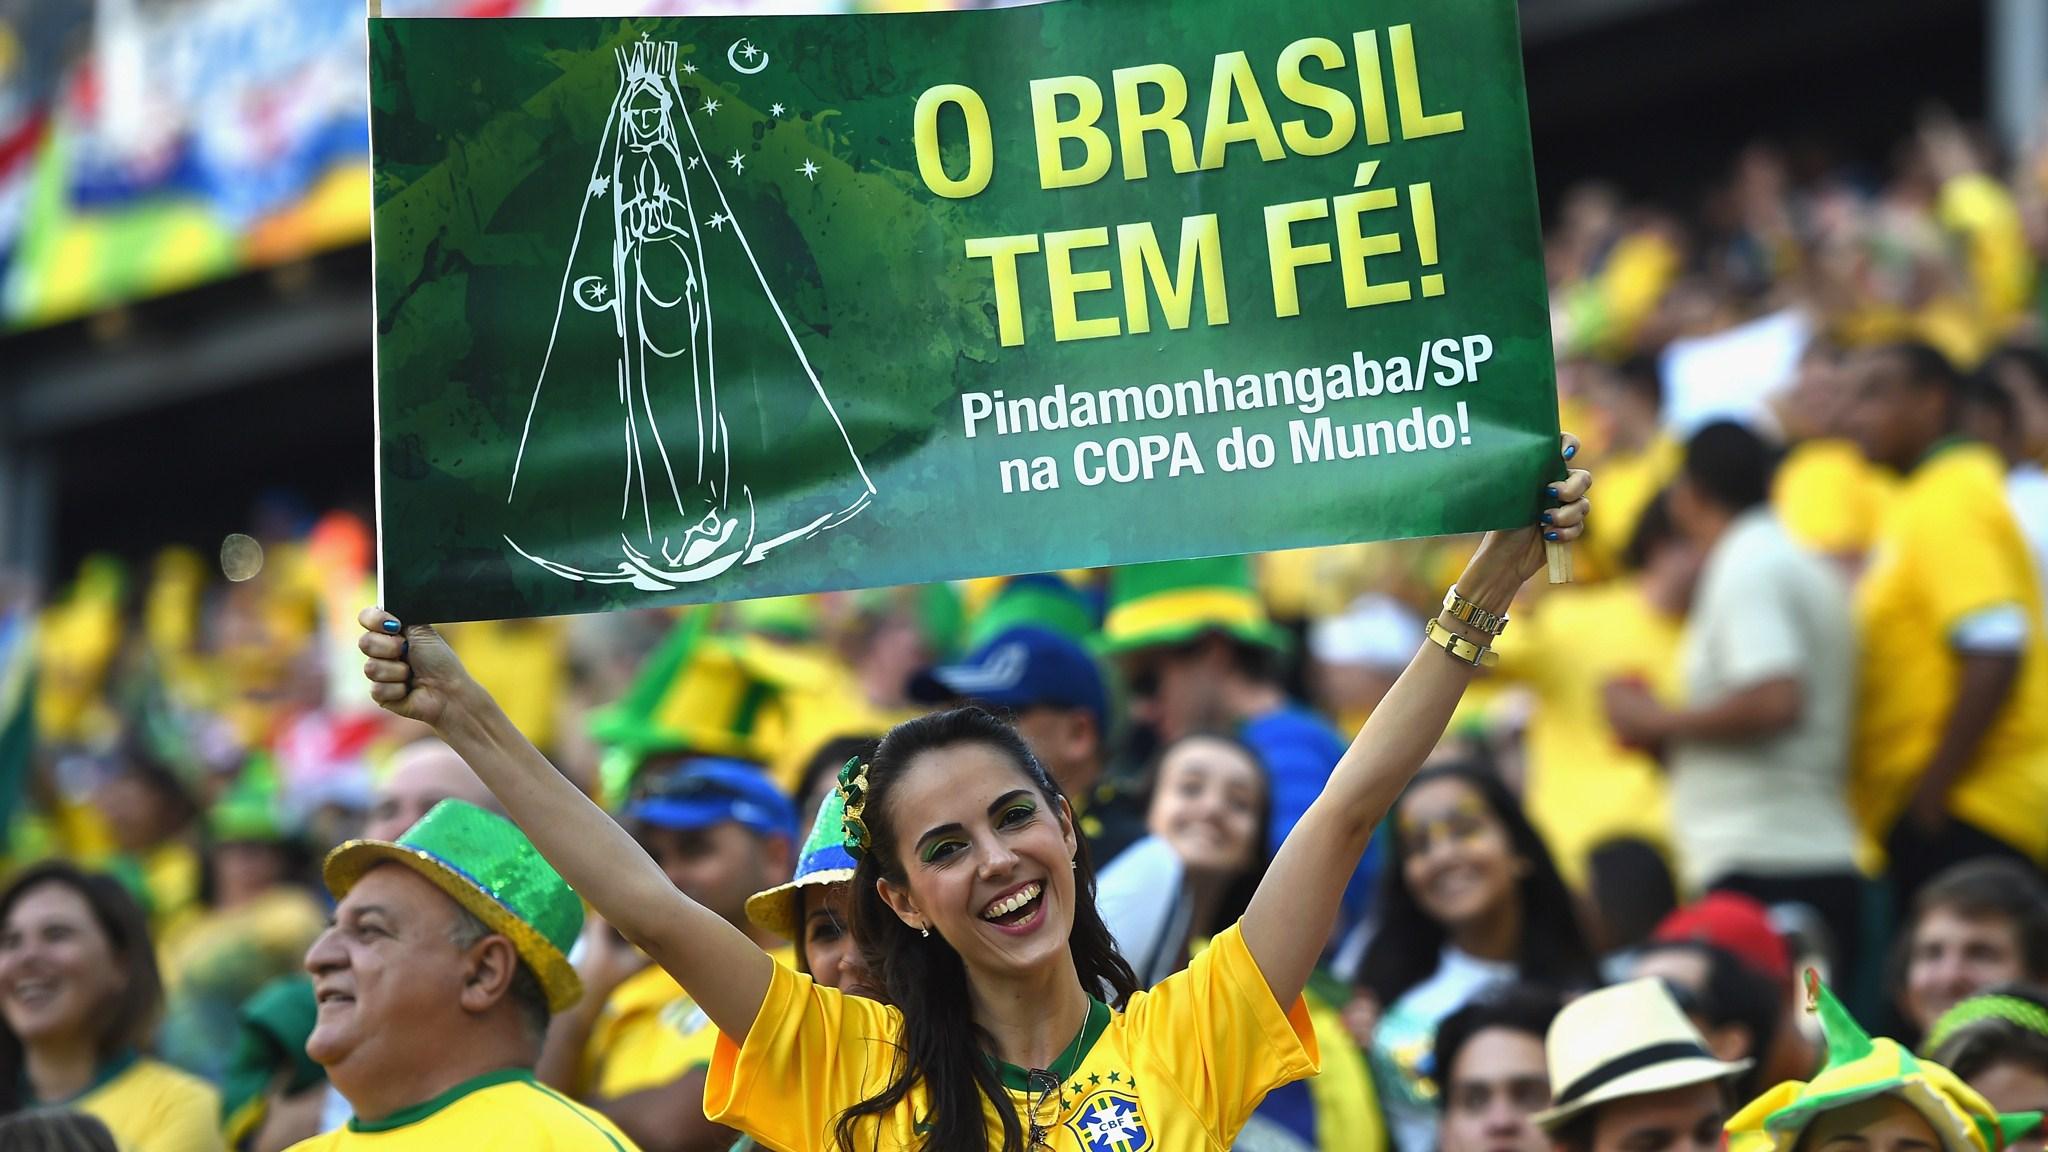 188 - Brazil-Croatia [3-1] -- 12 Jun 2014 - 17-00 -- Sao Paulo - Arena Corinthians